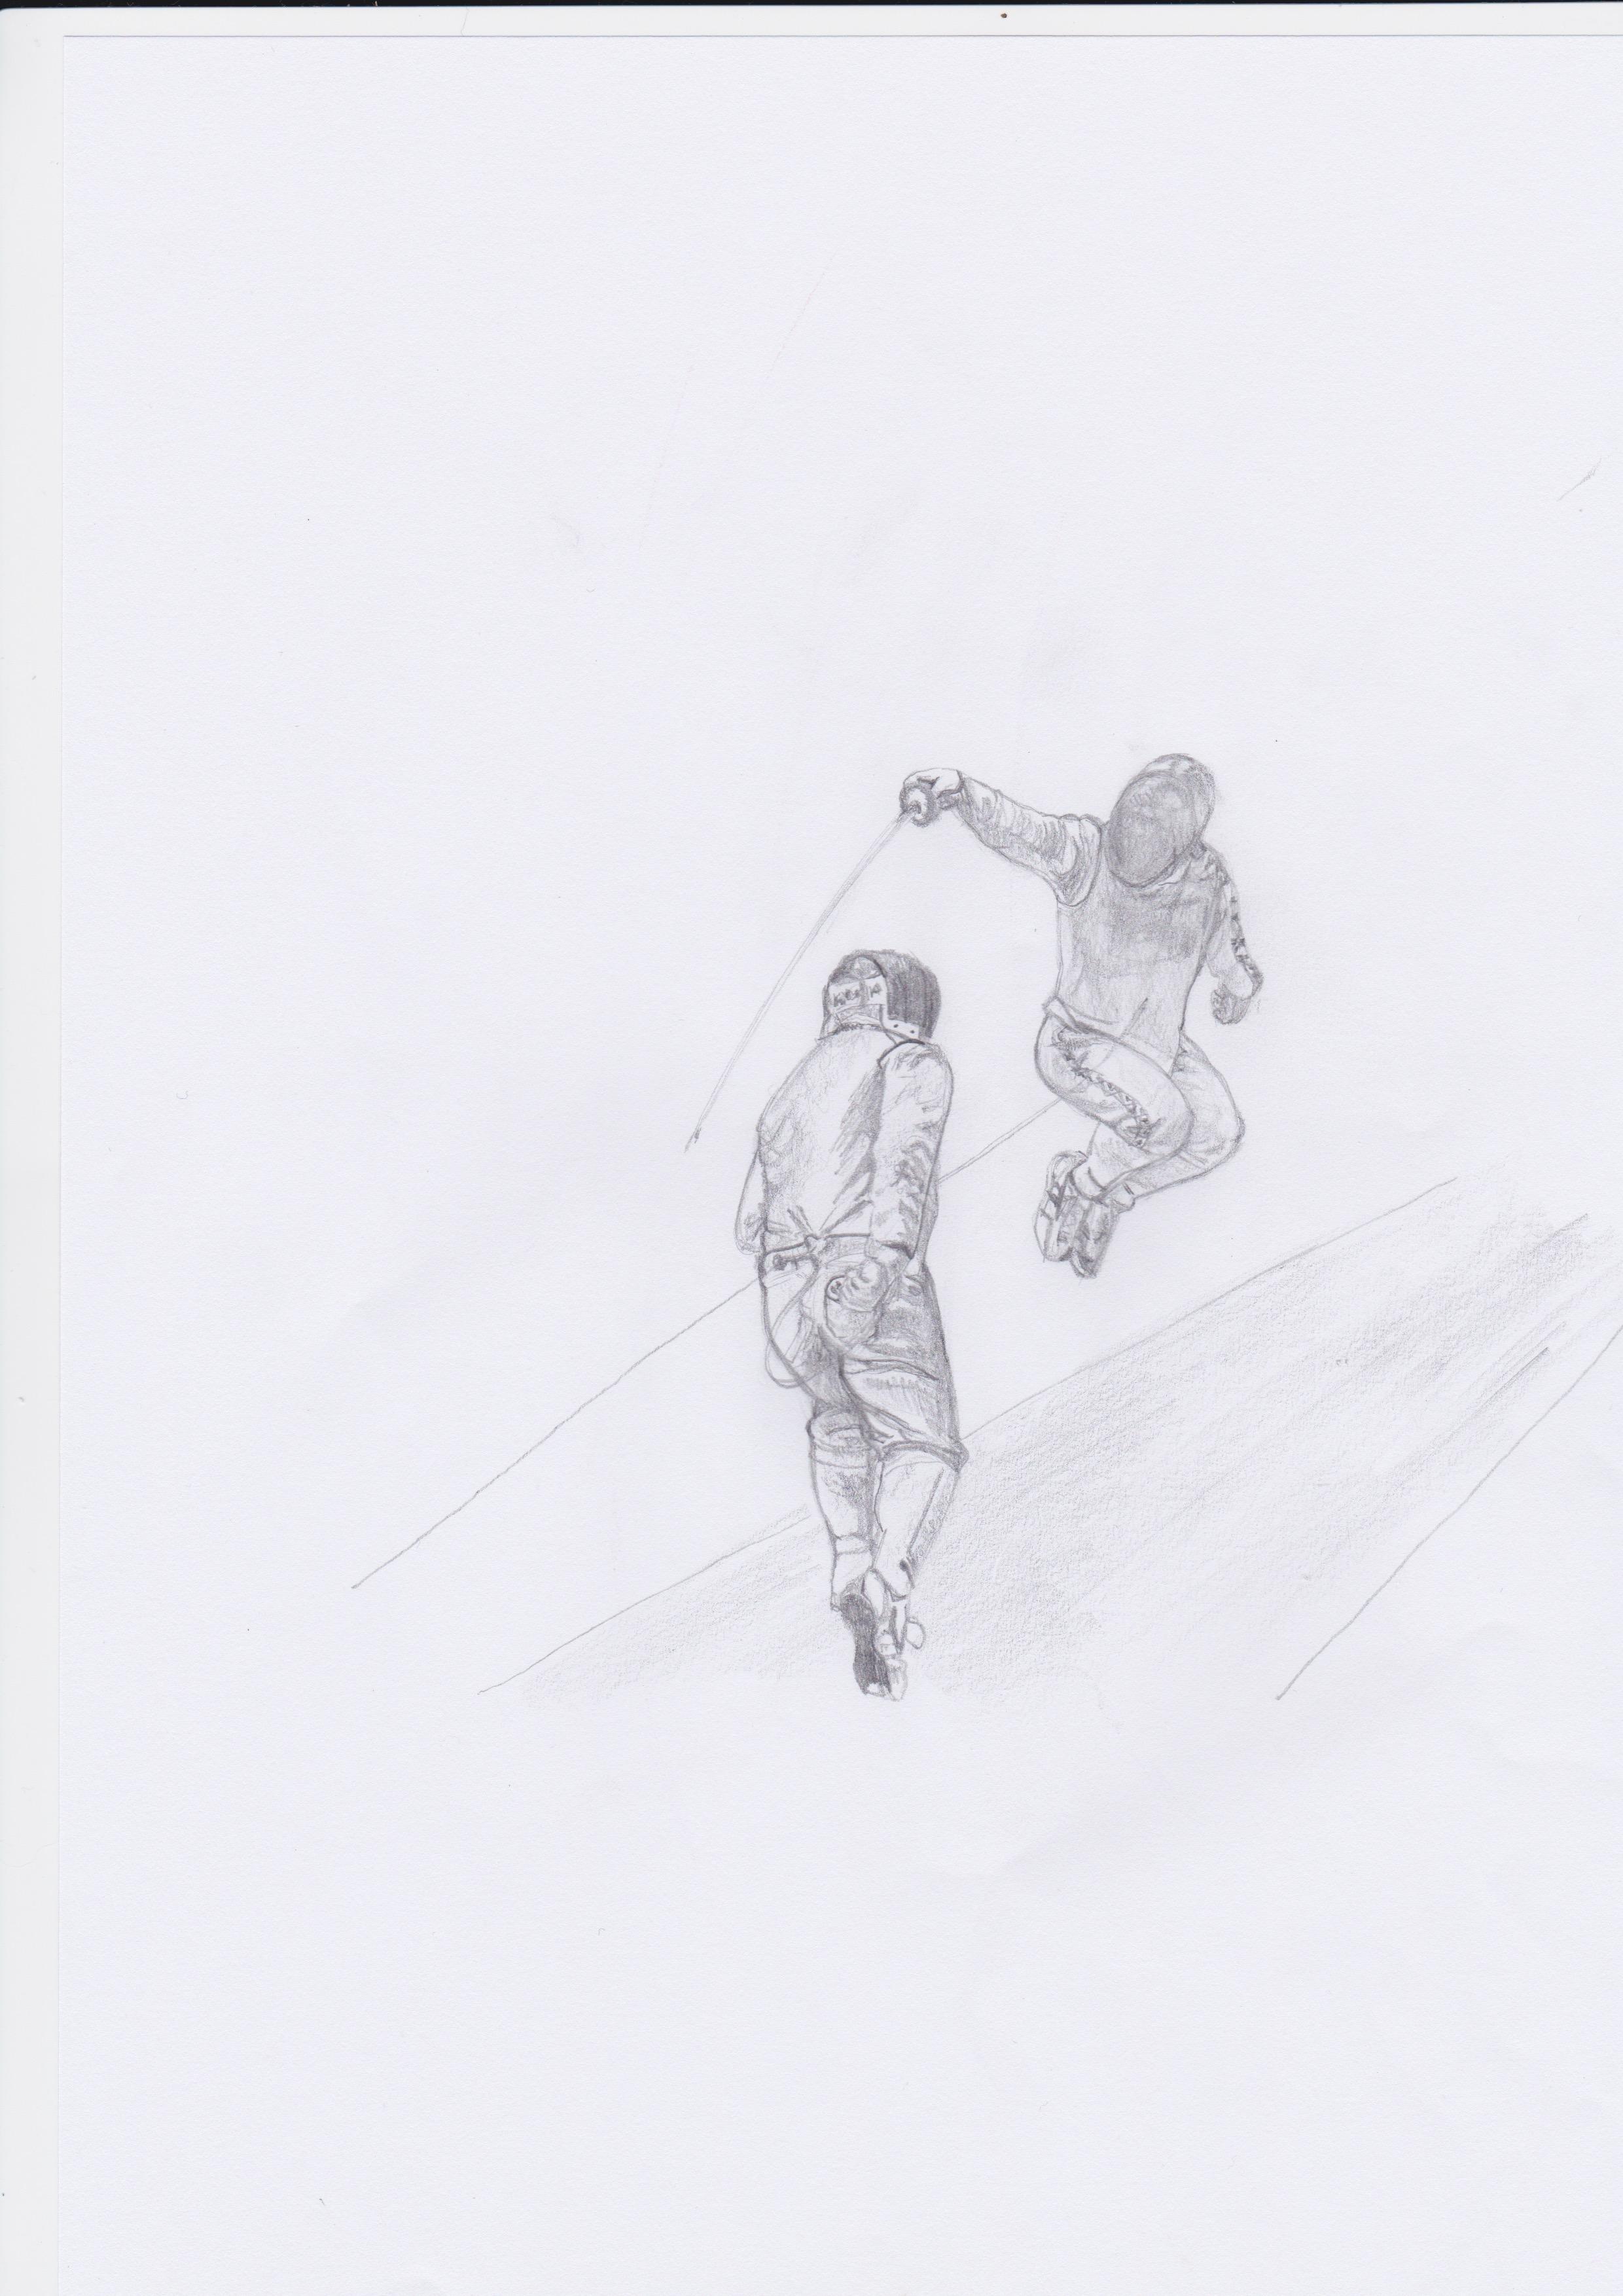 Fencing Sketch 2 by Gianna Colligiani .jpeg